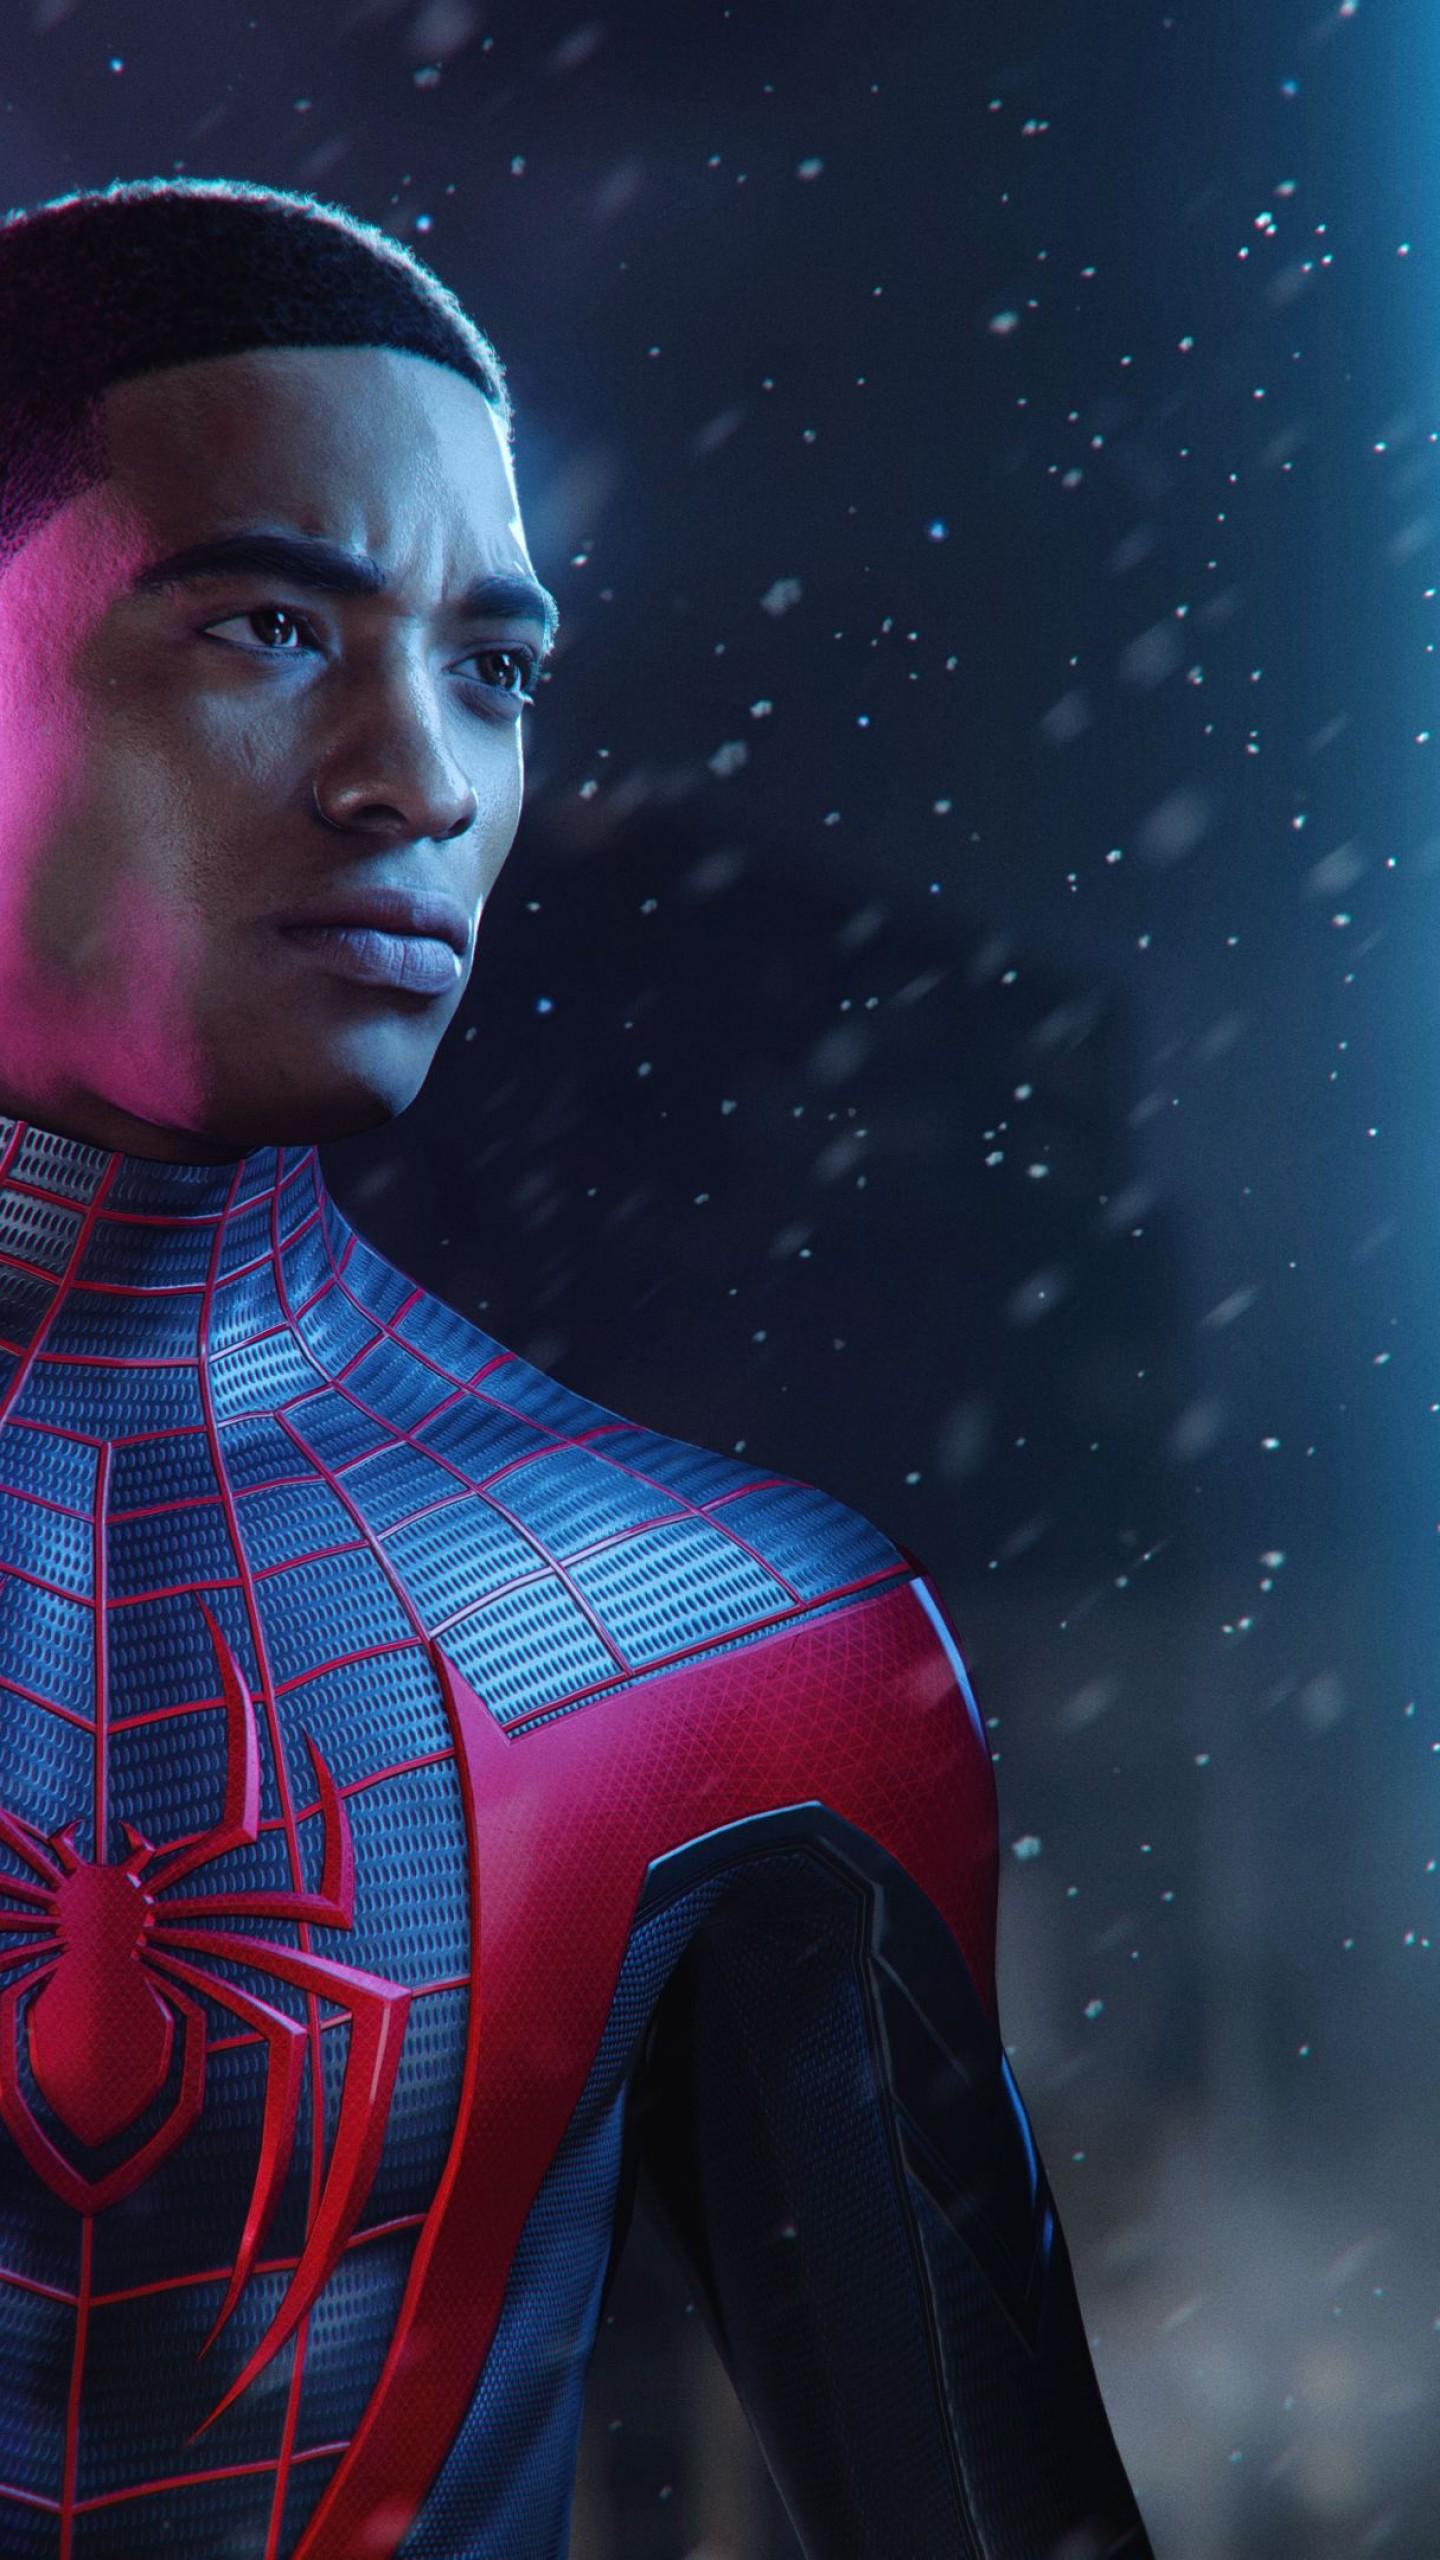 Wallpaper Spider Man Miles Morales Ps5 Playstation 5 Blm Games 22576